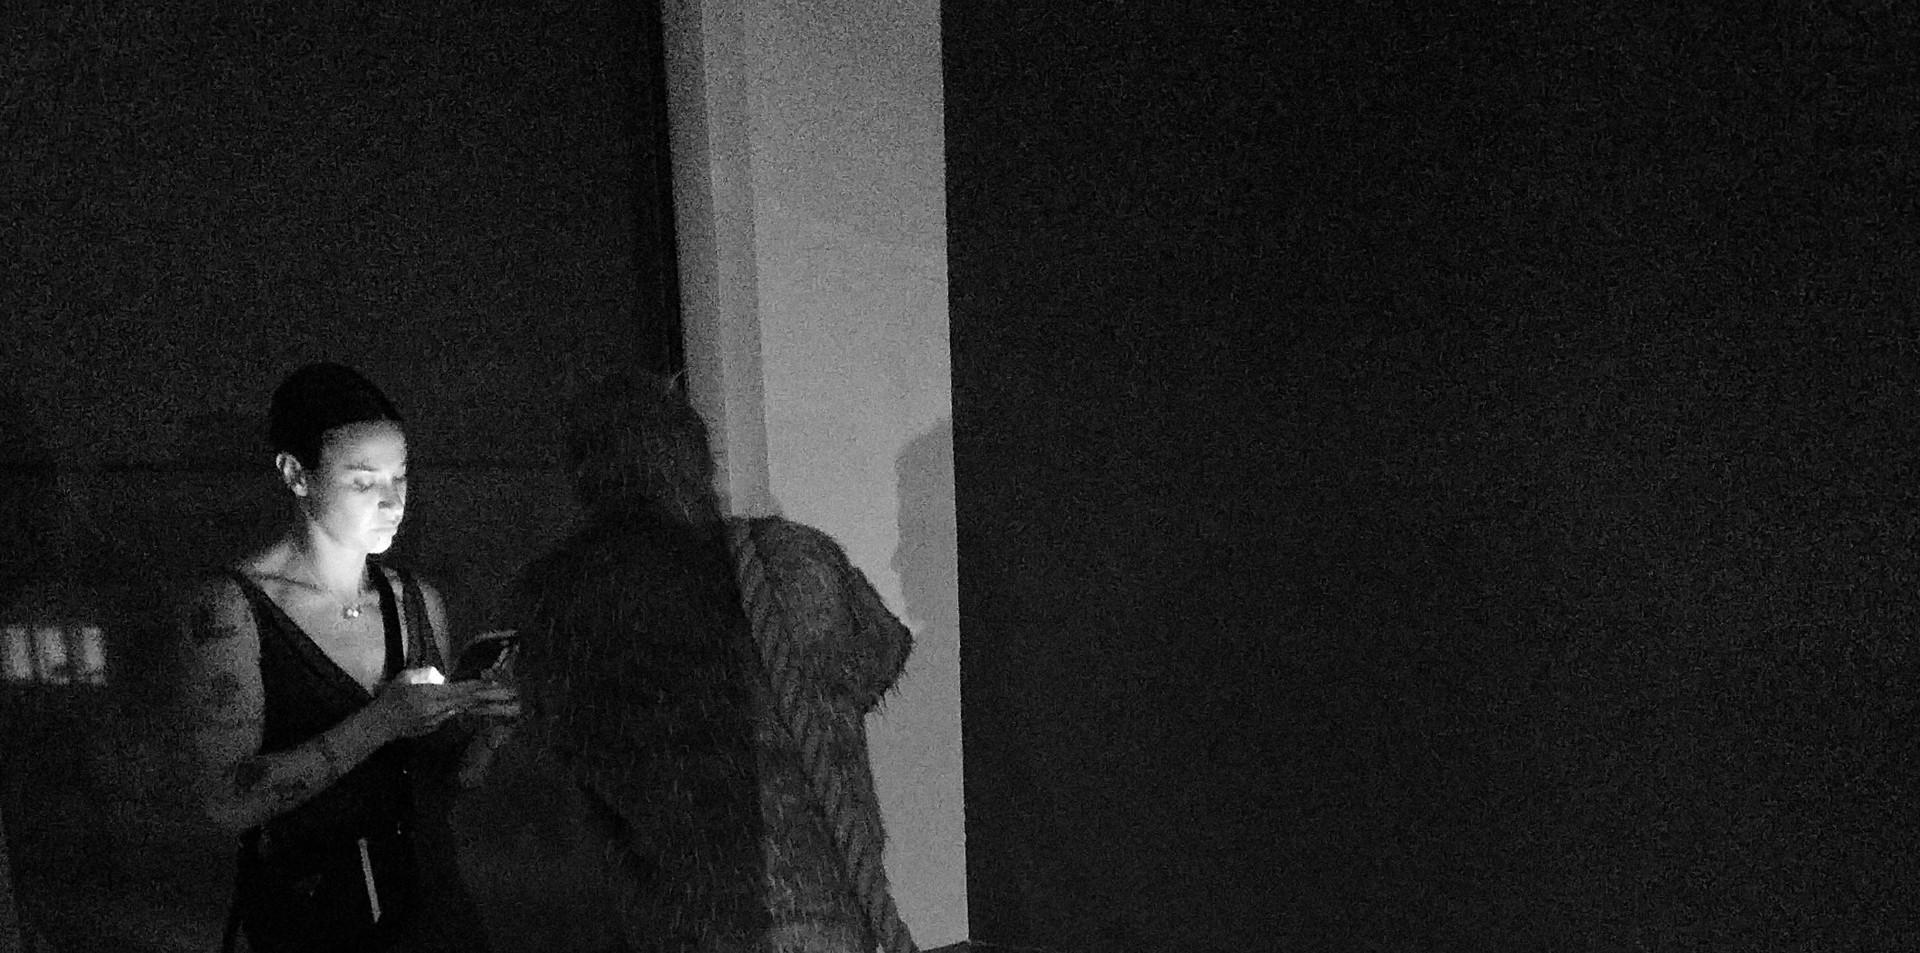 Unobserved Watcher in the Shadow